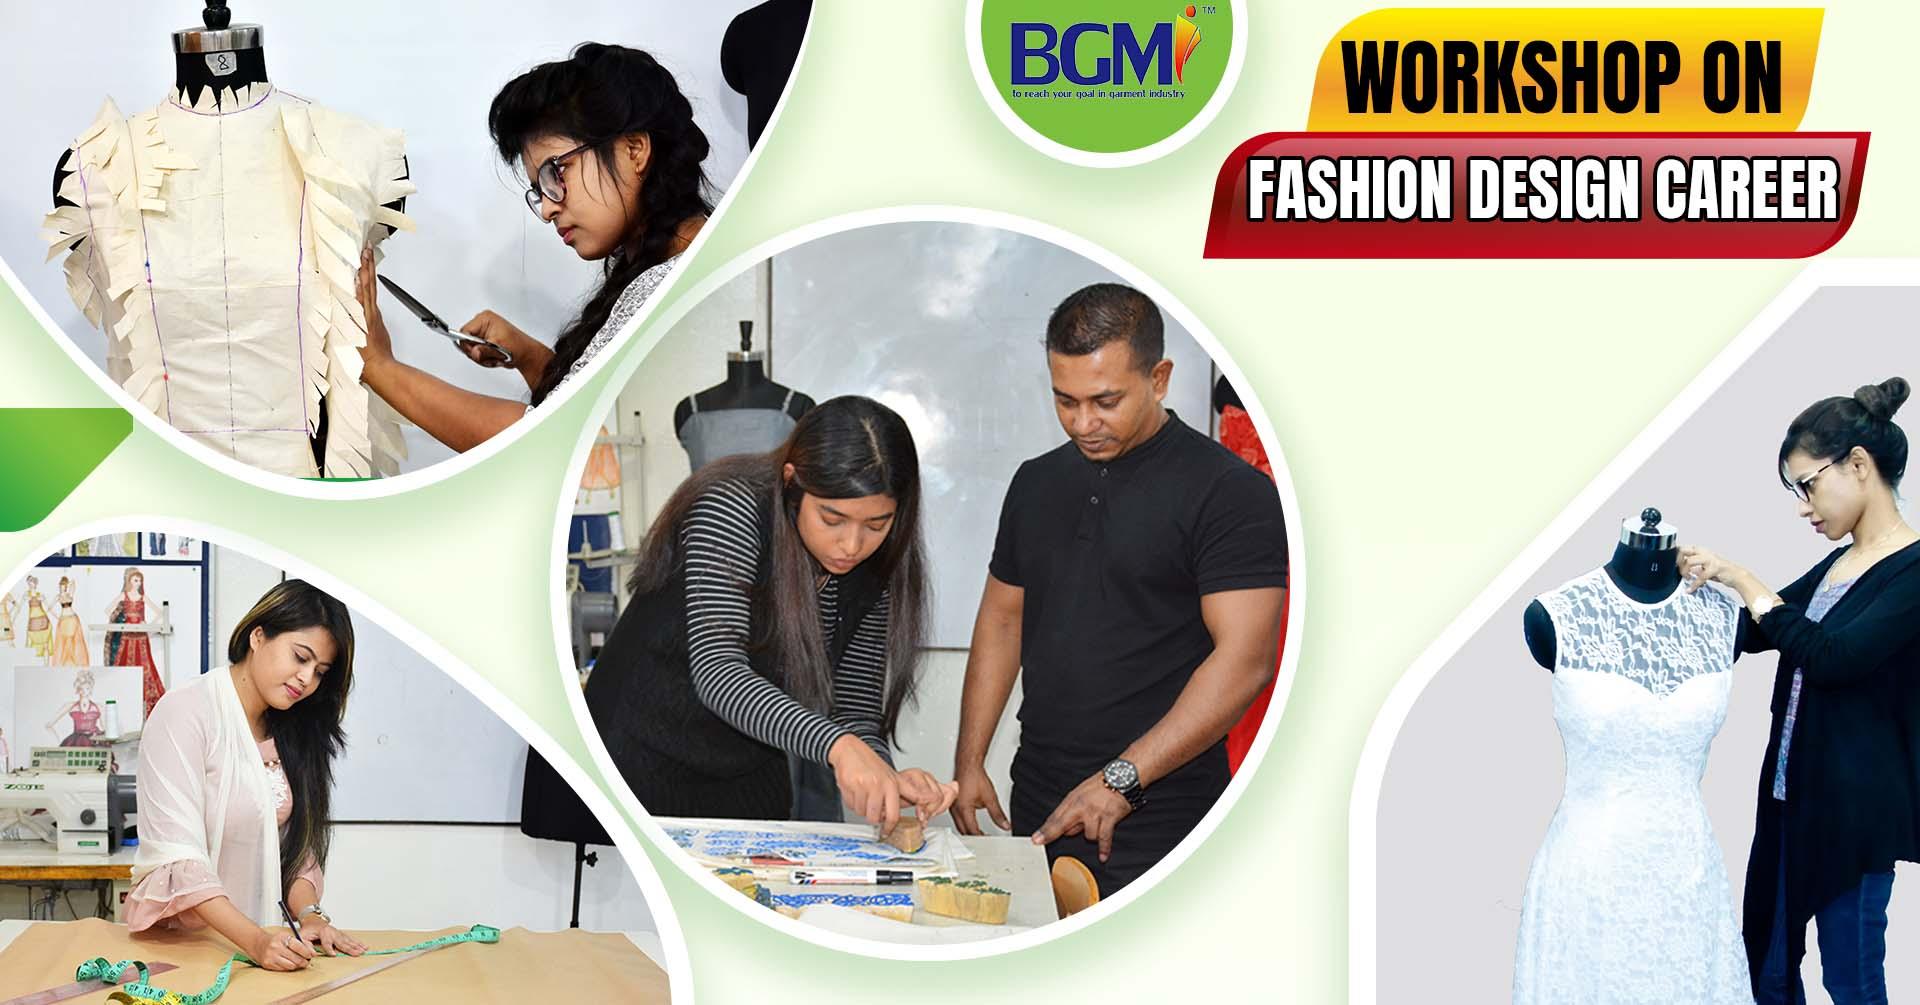 bgmi-regisatration-form-fashion-design-banner